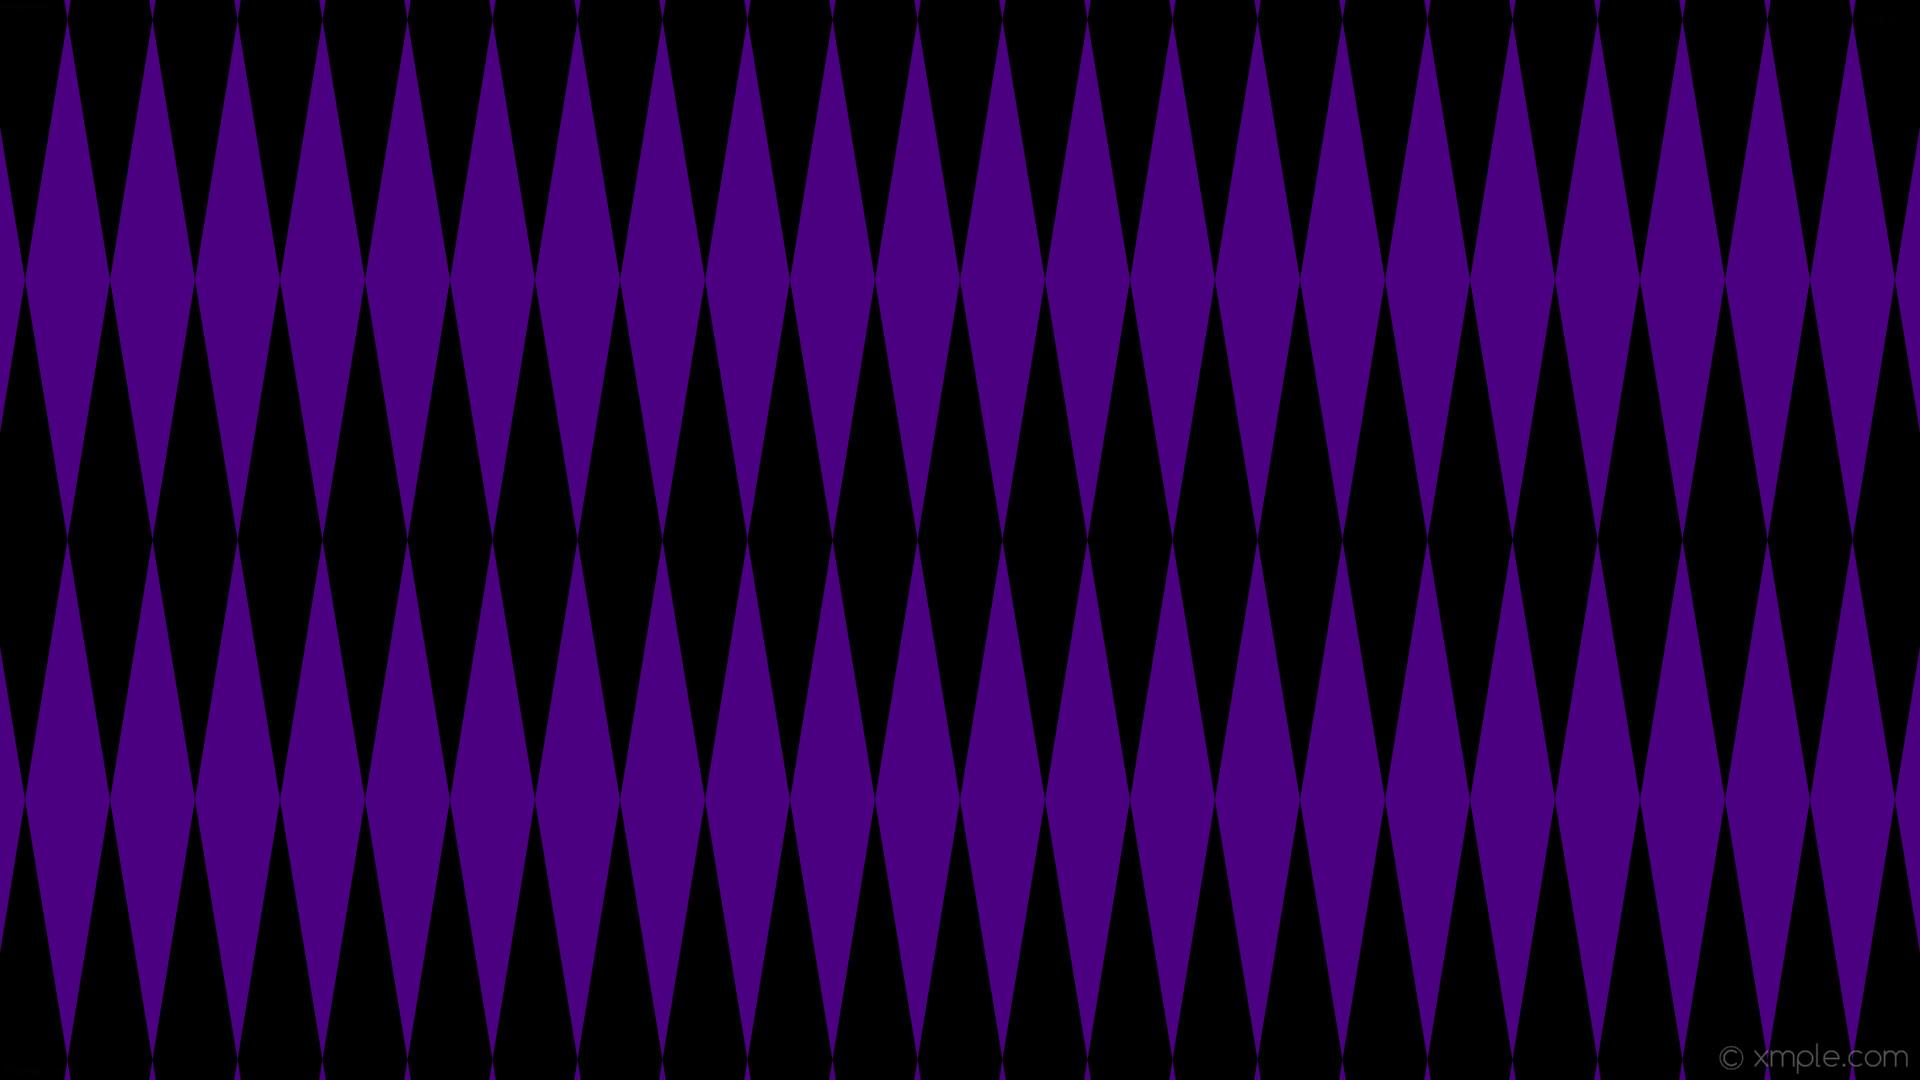 wallpaper lozenge black purple diamond rhombus indigo #000000 #4b0082 90°  520px 85px